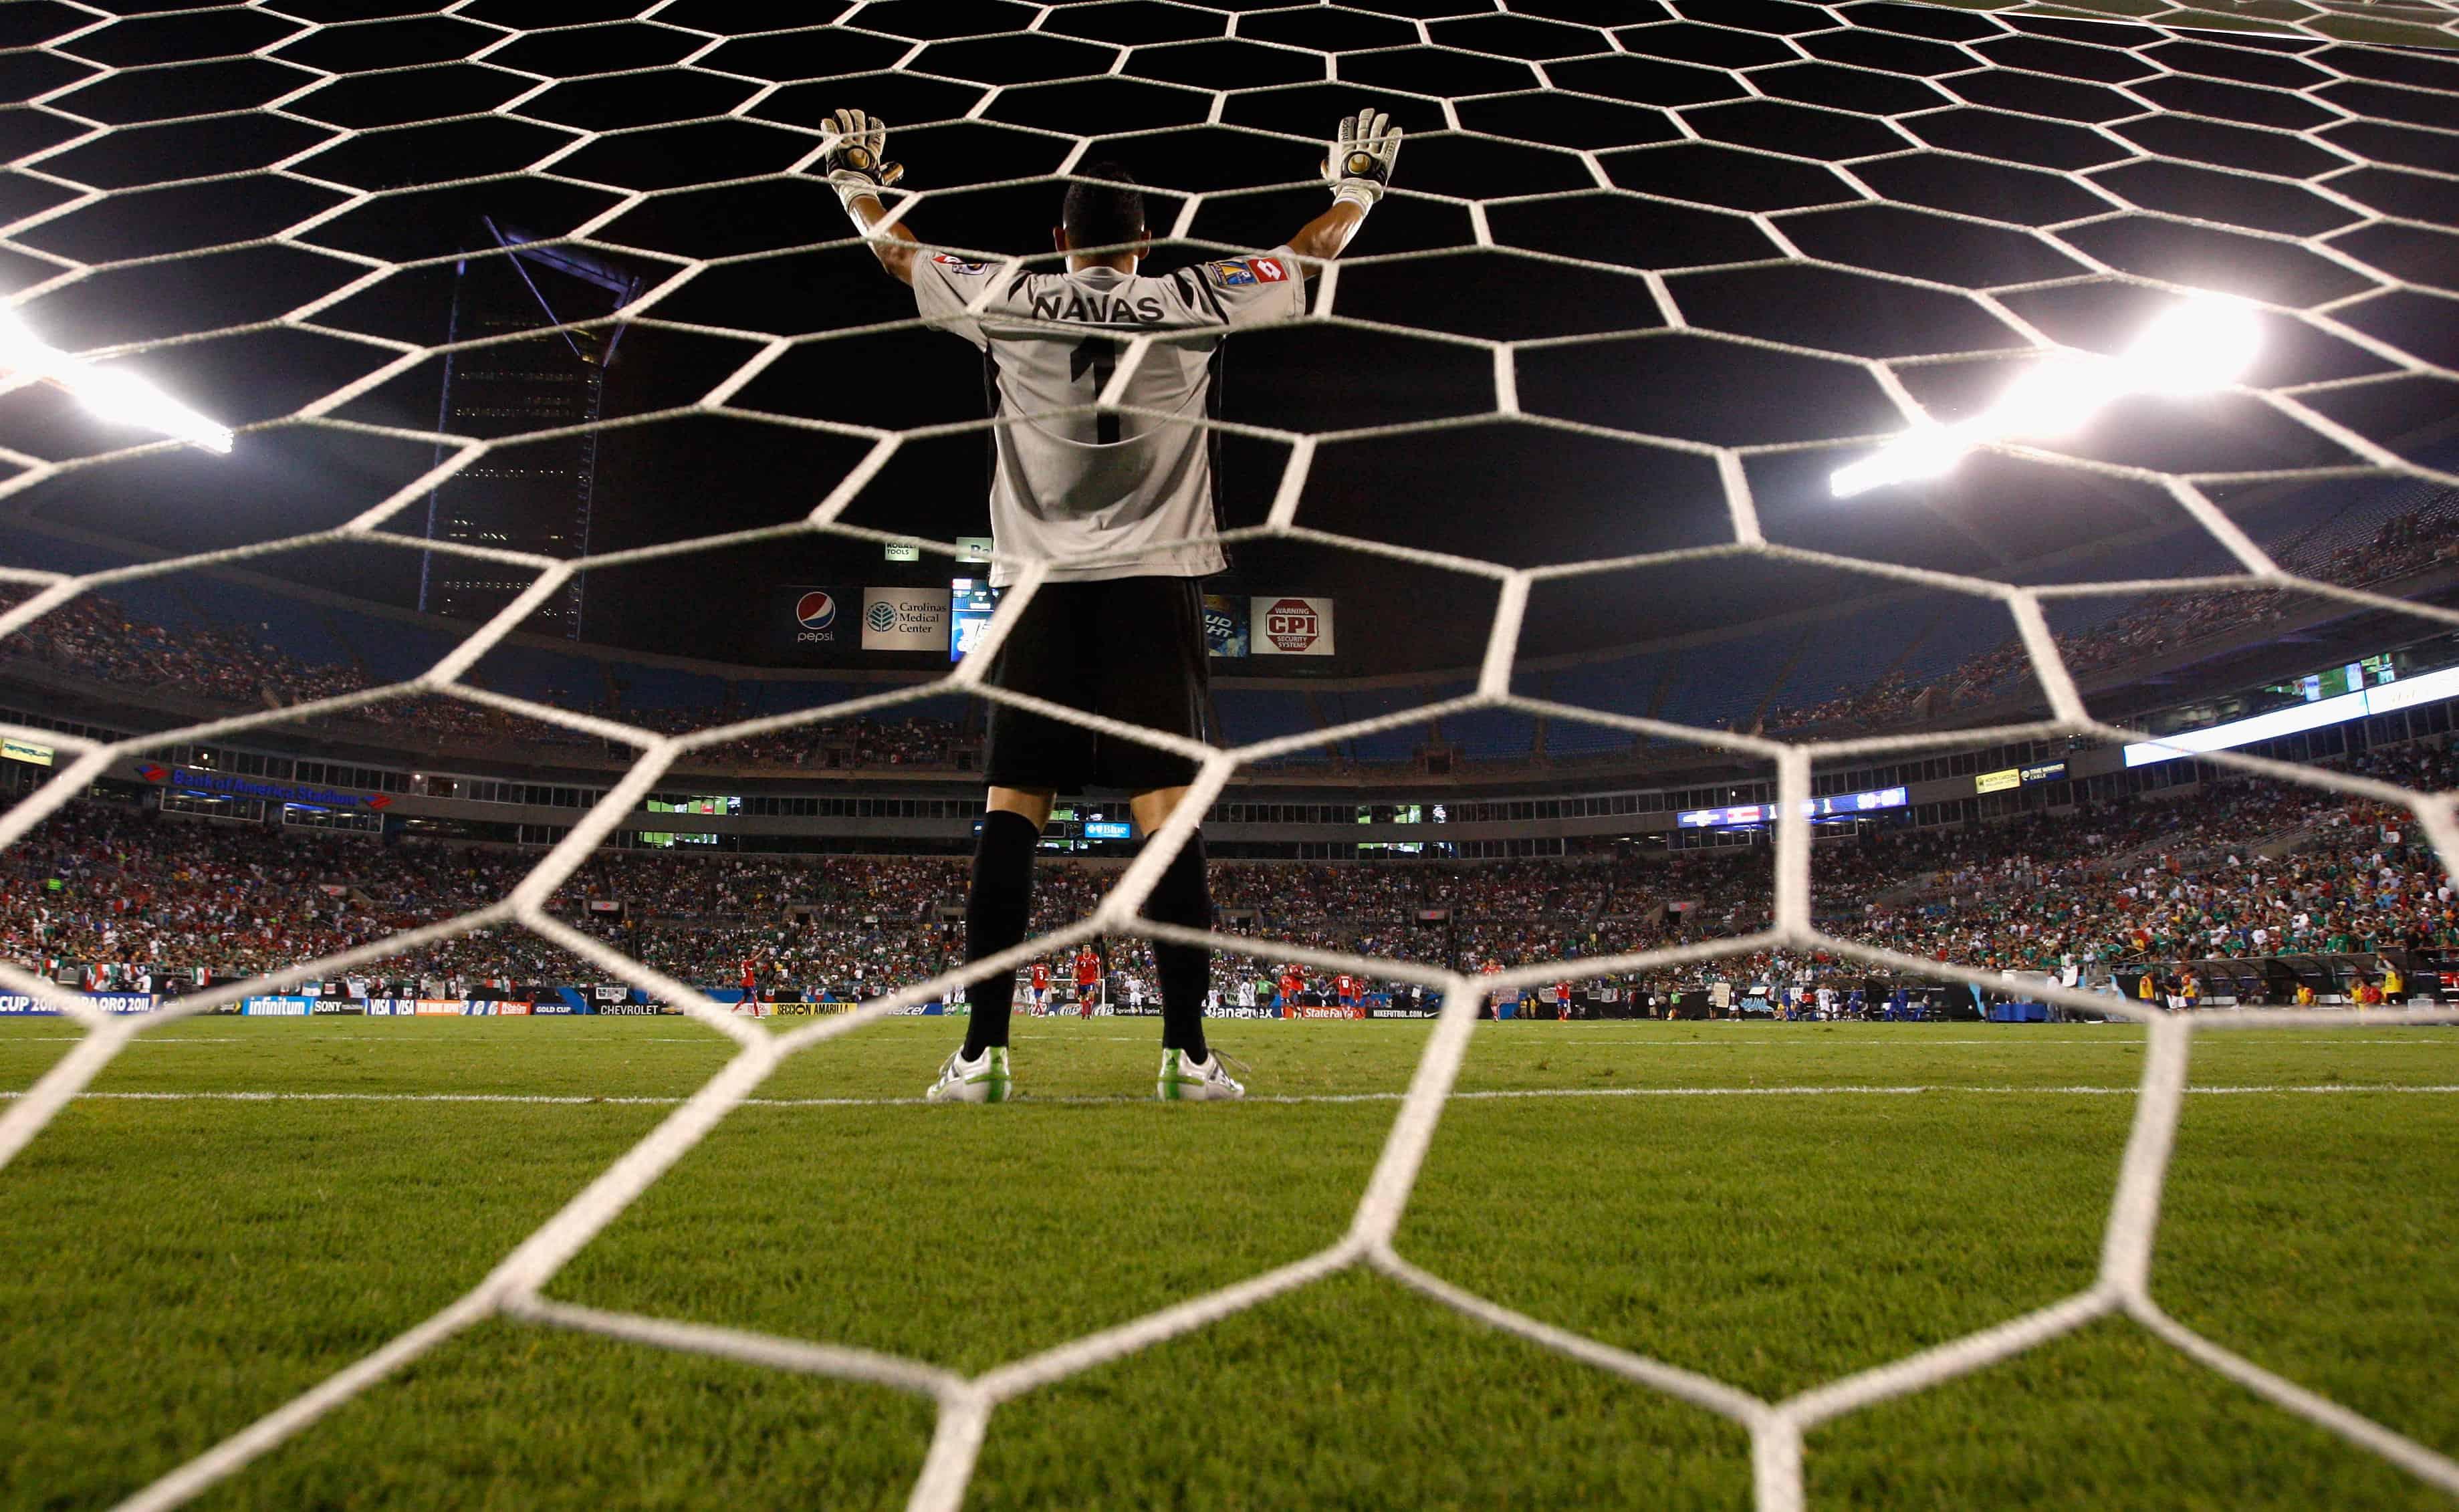 Costa Rican star goalie Keylor Navas